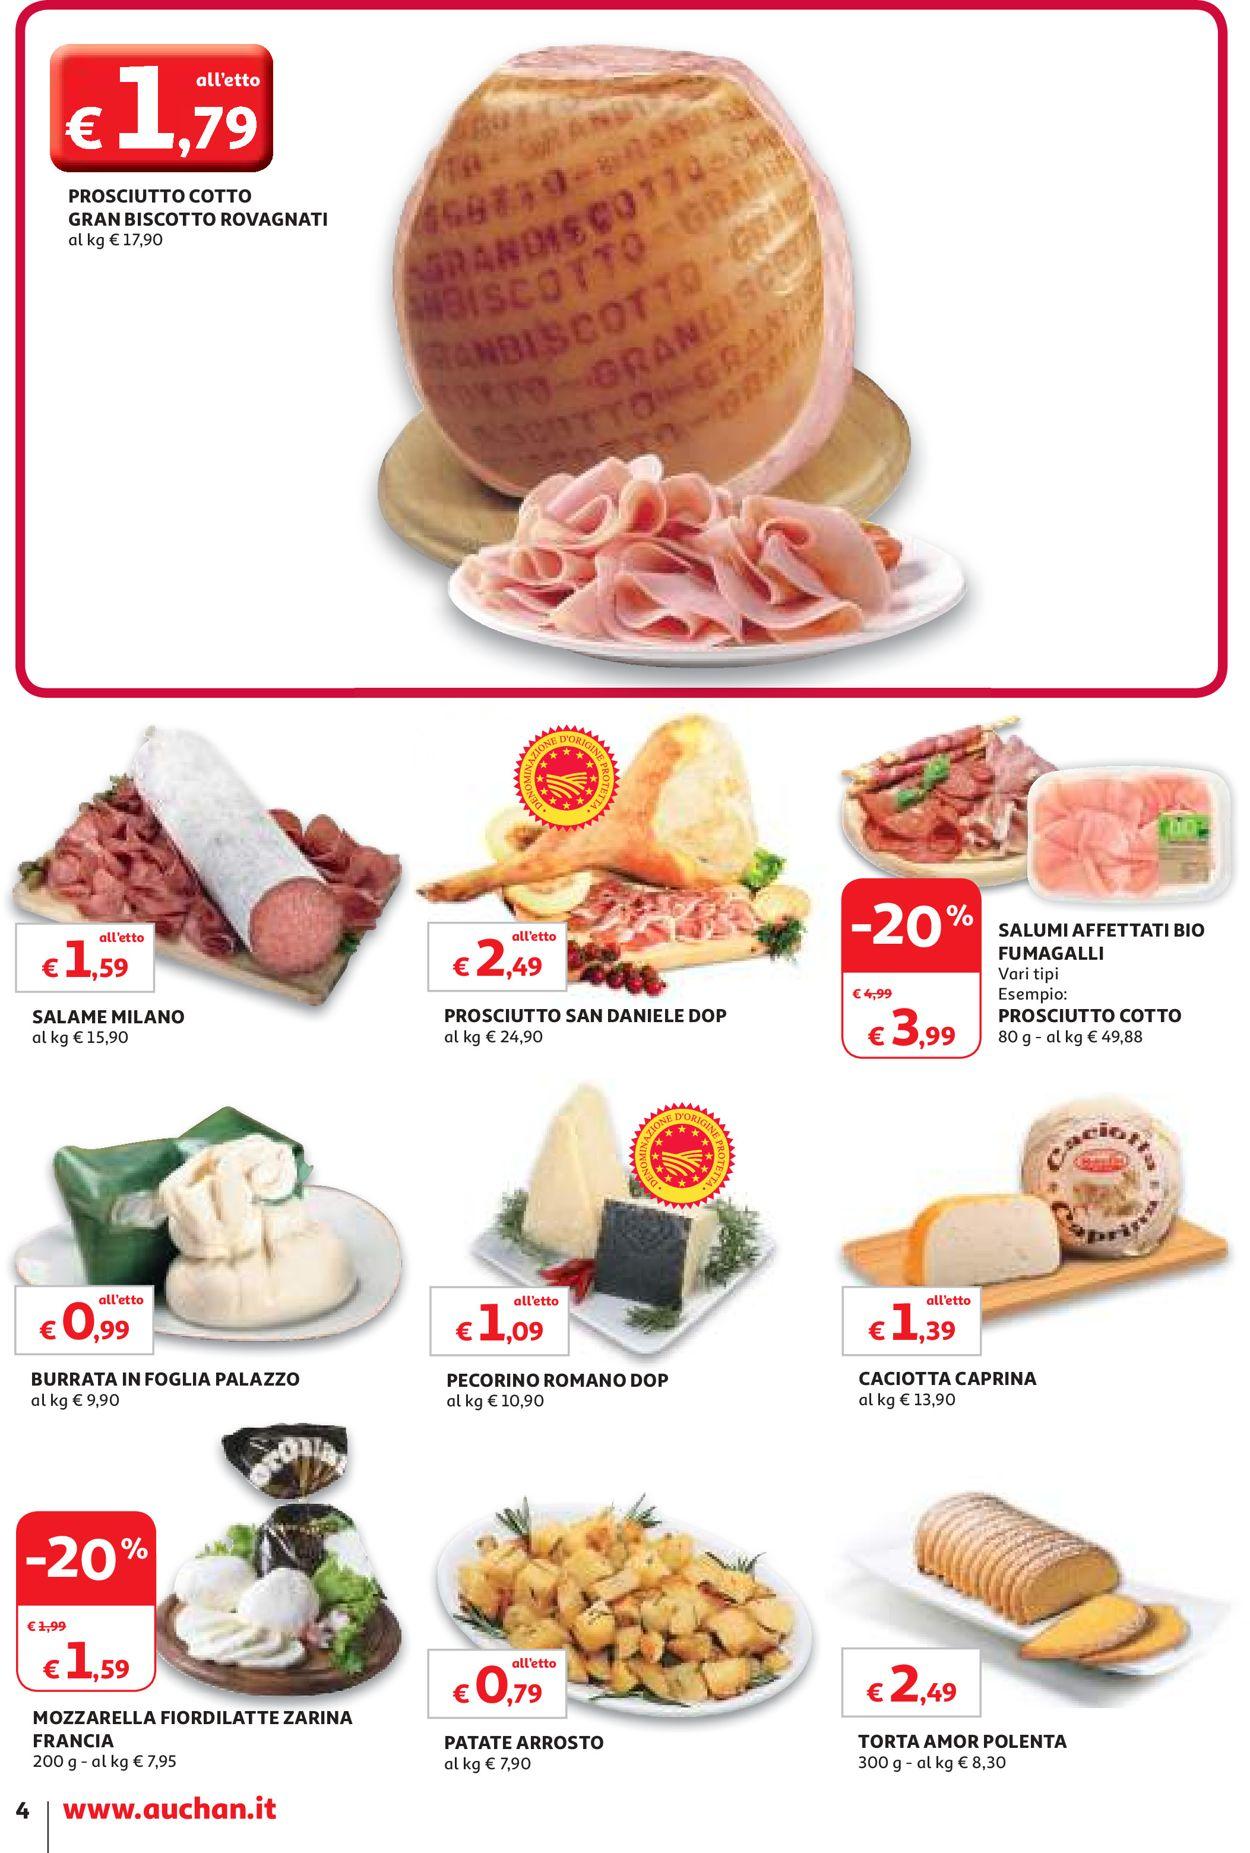 Volantino Auchan - Offerte 02/12-12/12/2019 (Pagina 4)